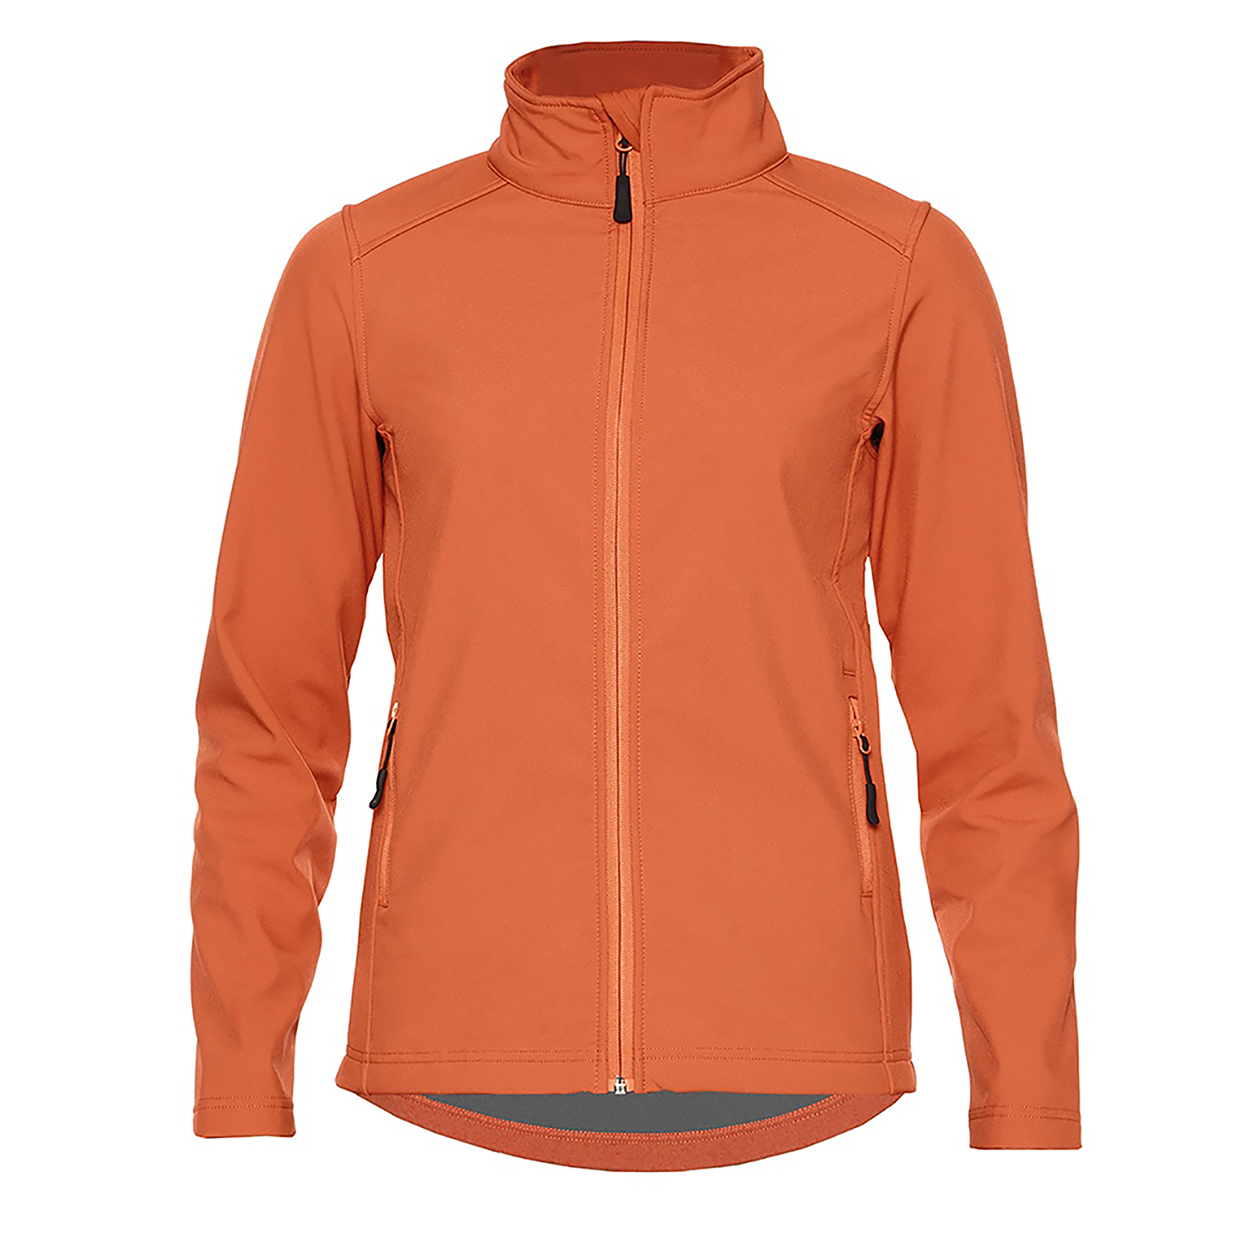 Gildan Womens/Ladies Hammer Soft Shell Jacket (XL) (Orange)